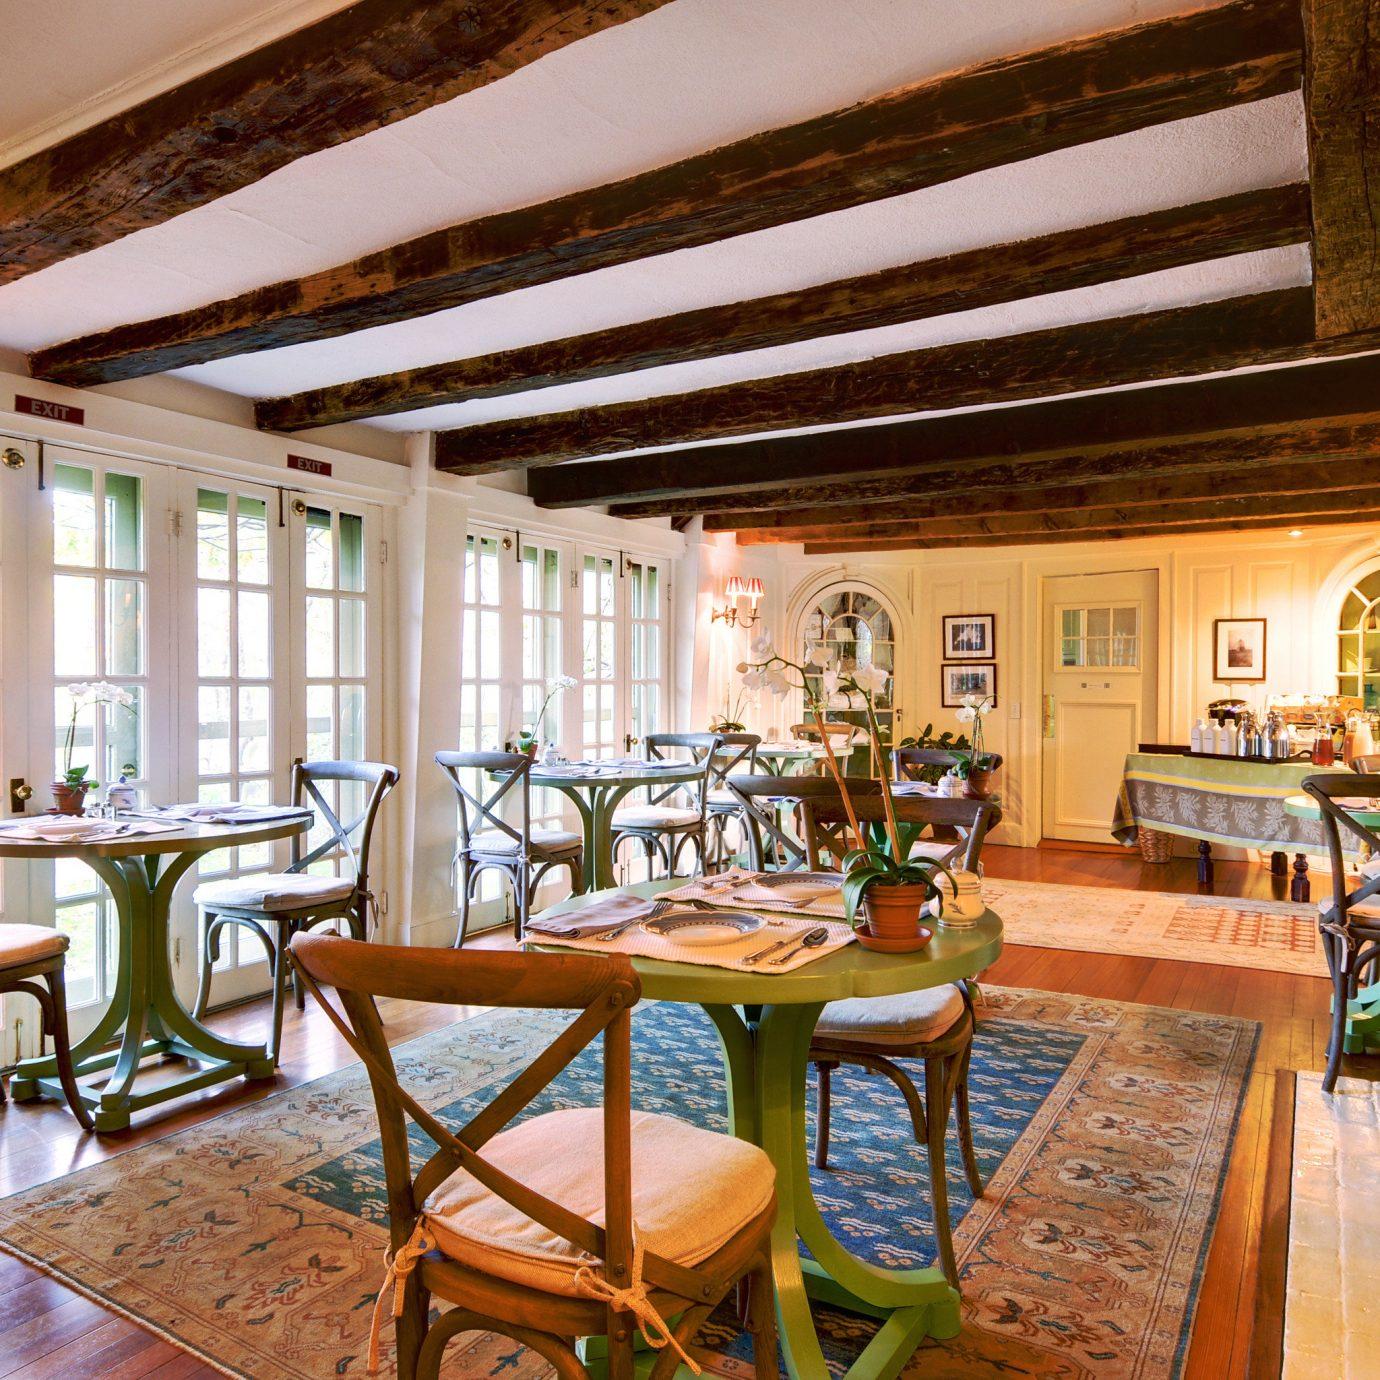 B&B Dining Eat Elegant Historic Inn Romantic Wellness chair property Resort home living room restaurant cottage Villa mansion farmhouse Lobby recreation room